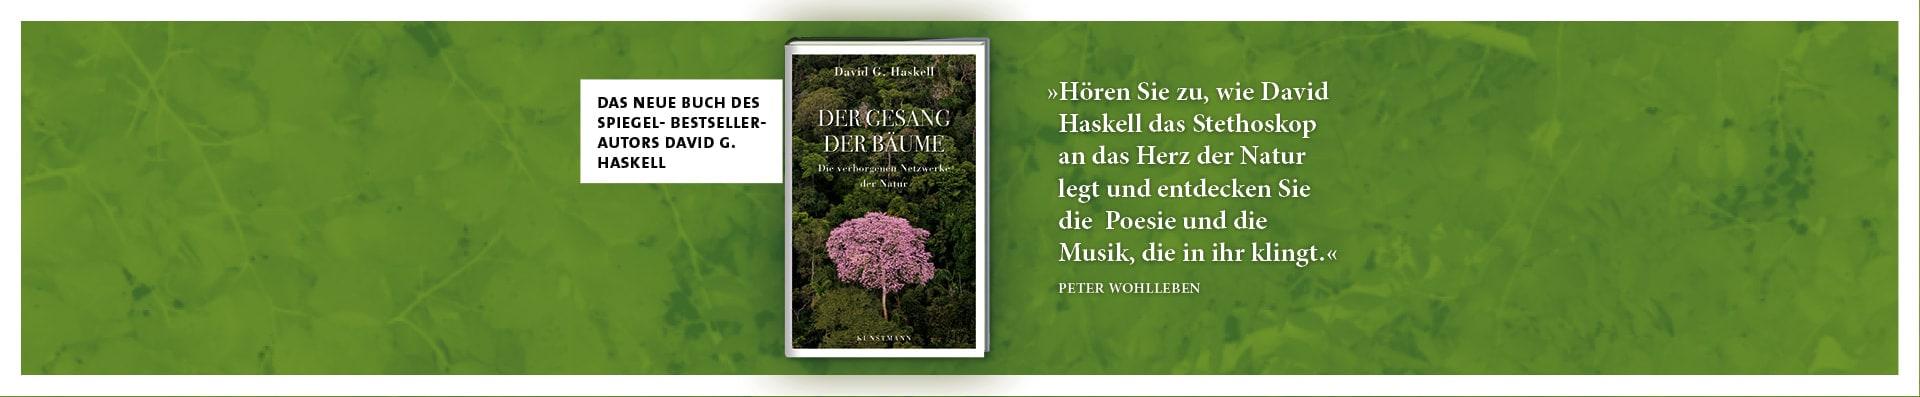 David G. Haskell - Der Gesang der Bäume